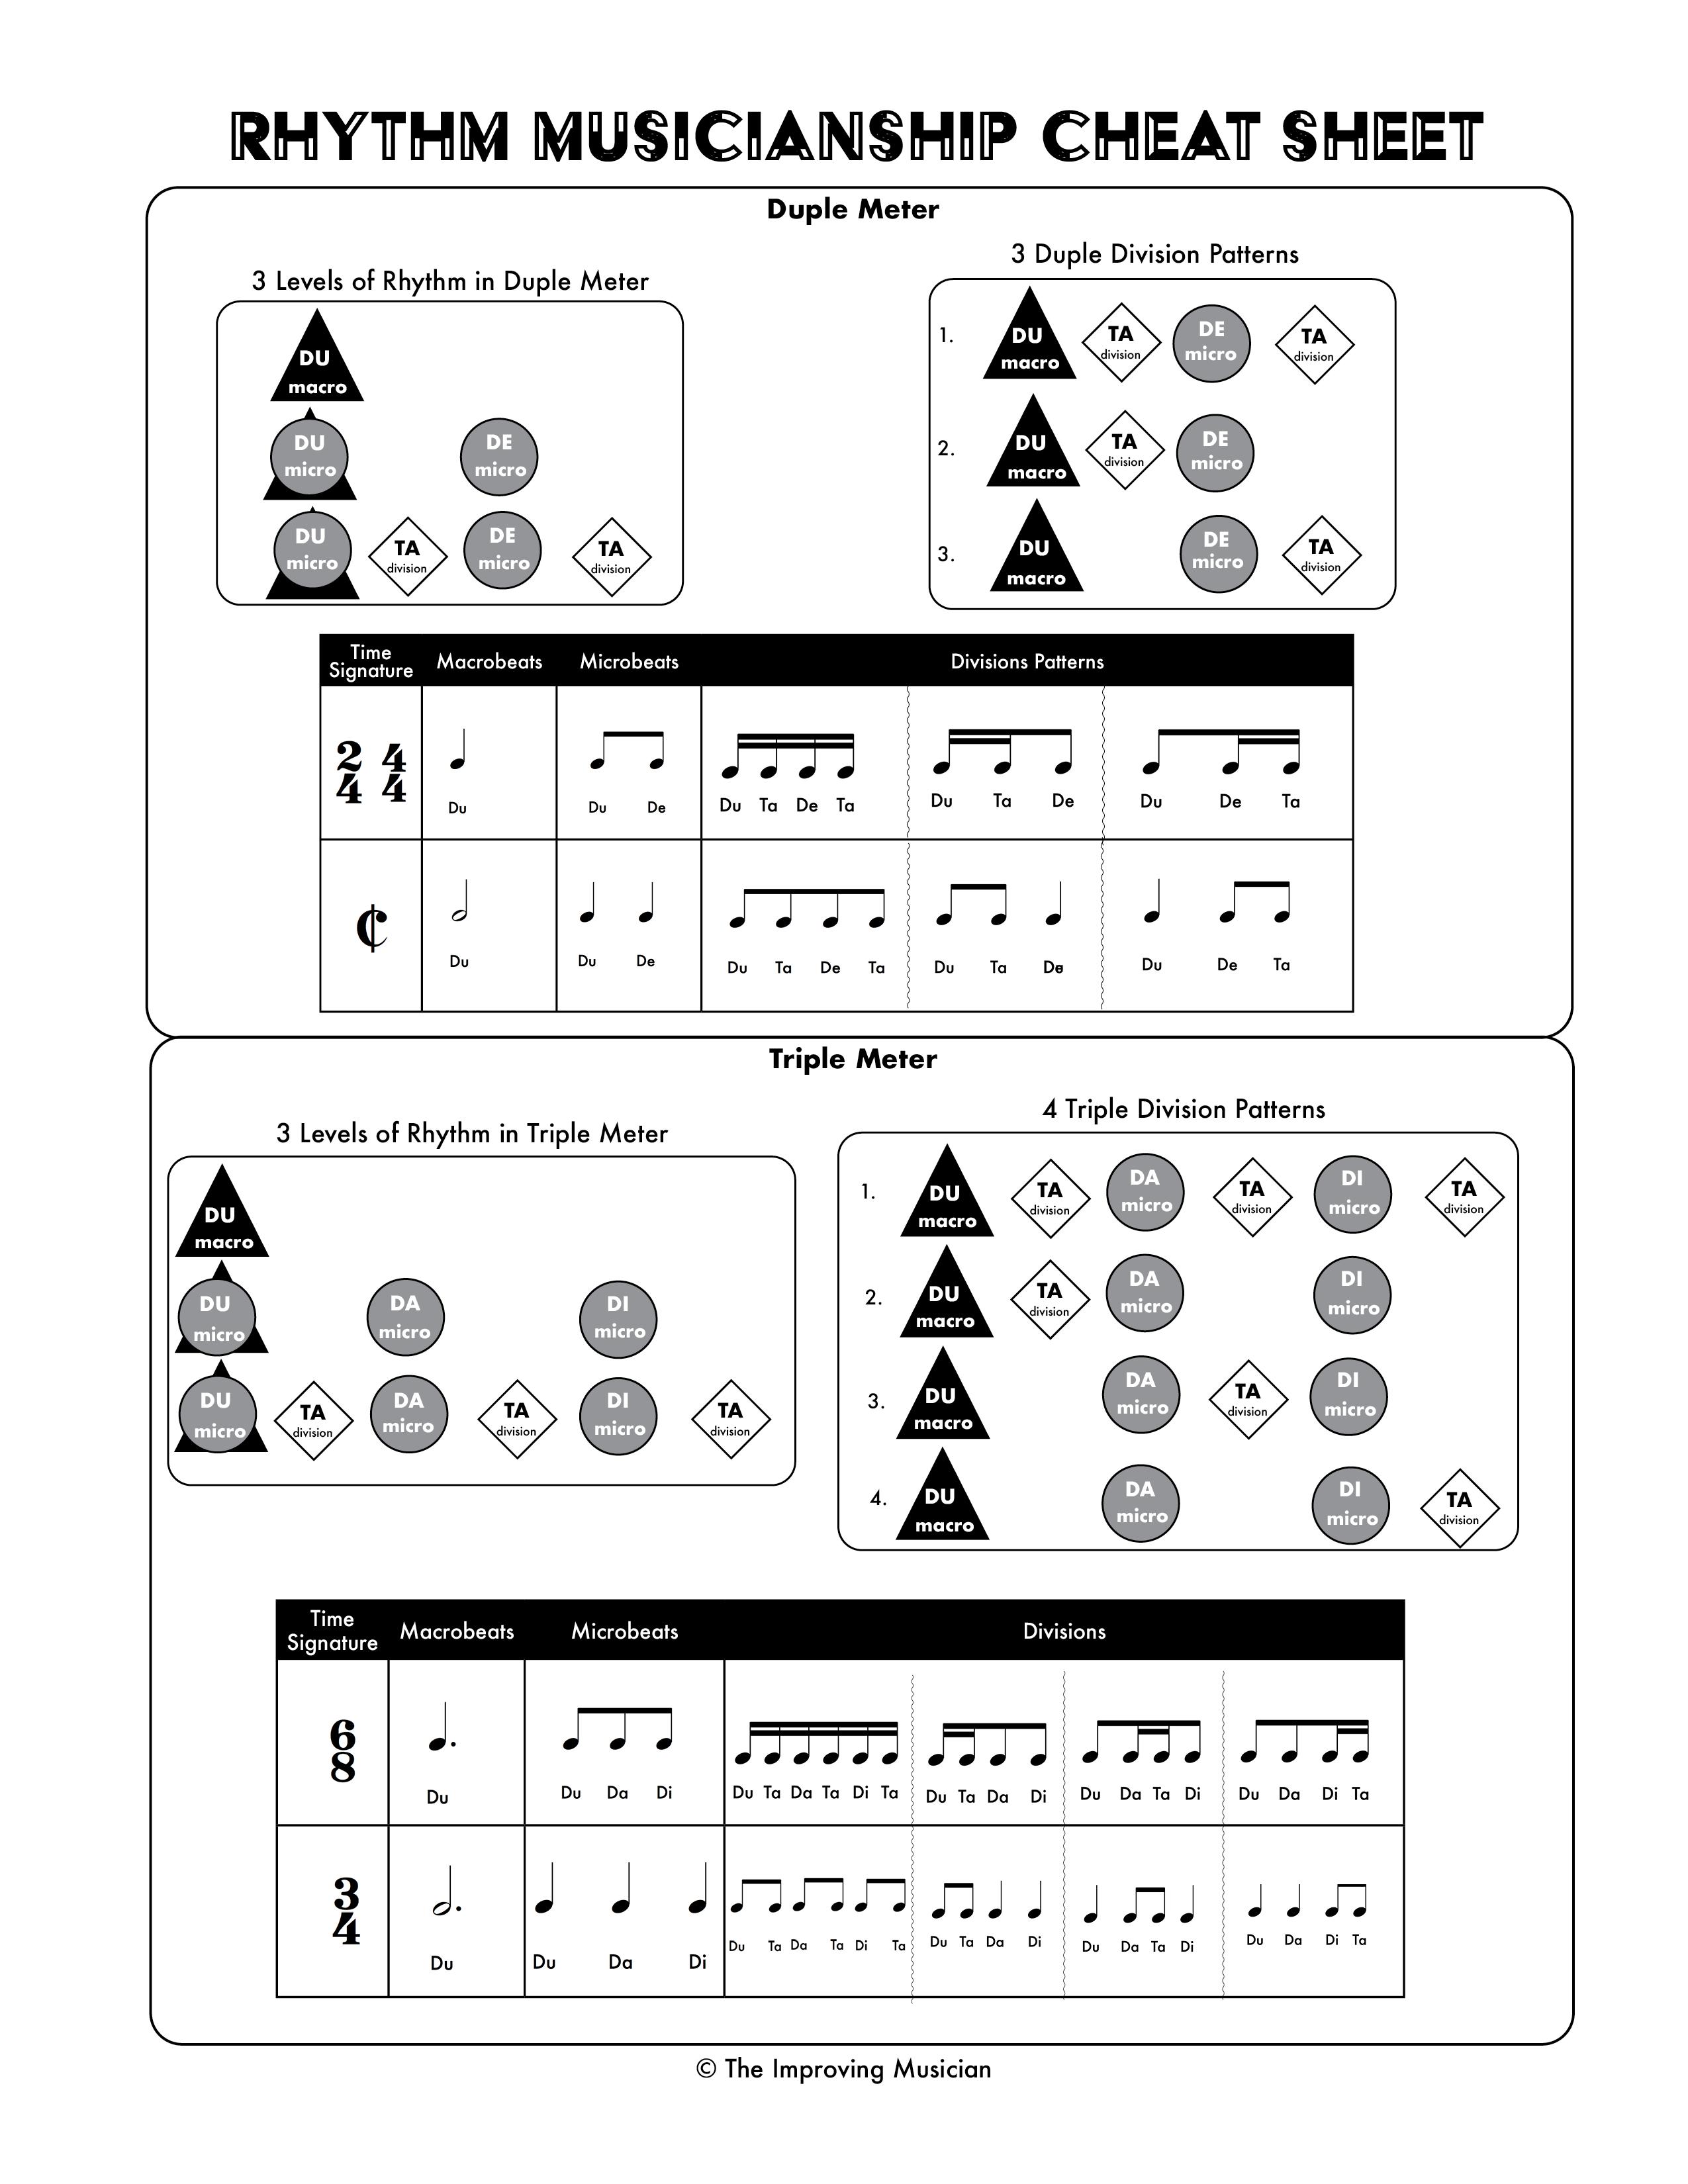 Rhythm Musicianship Cheat Sheet - Student Library